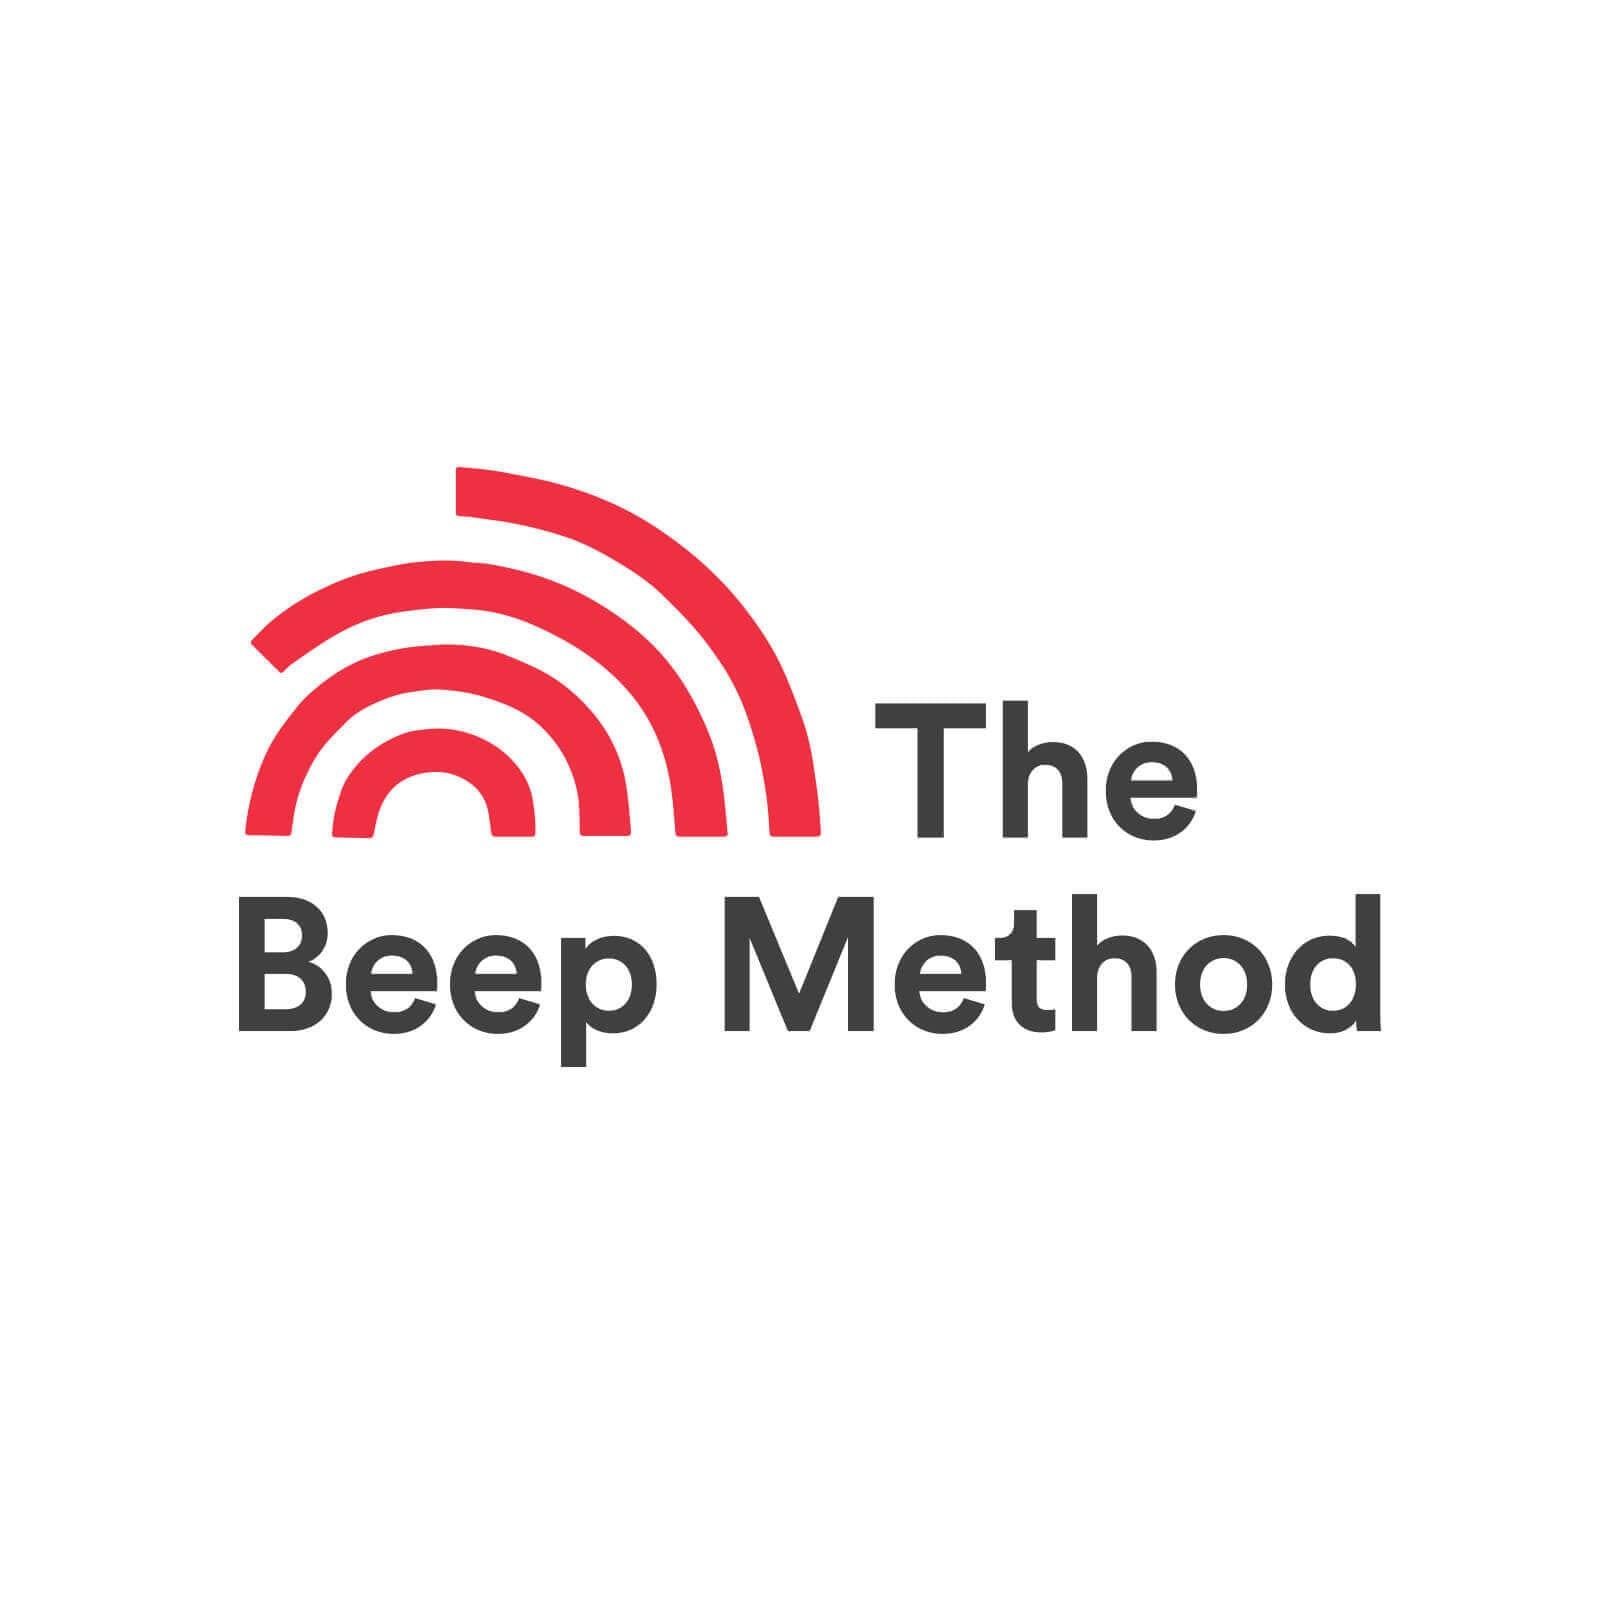 Beep Method